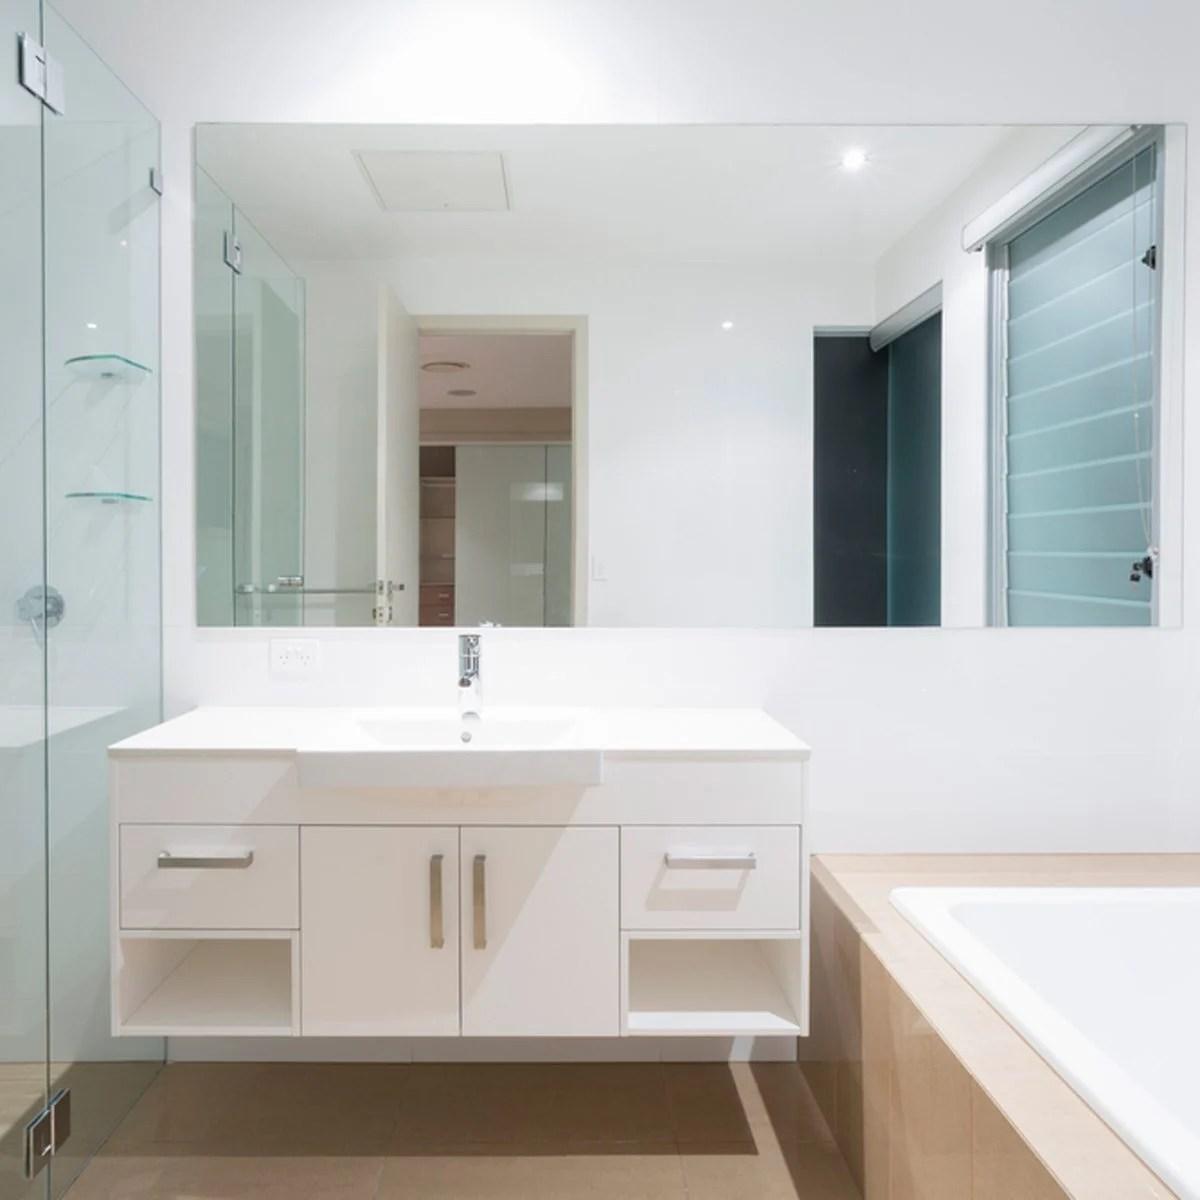 10 Genius Small Master Bathroom Ideas that WOW! | Family ... on Restroom Ideas  id=61035